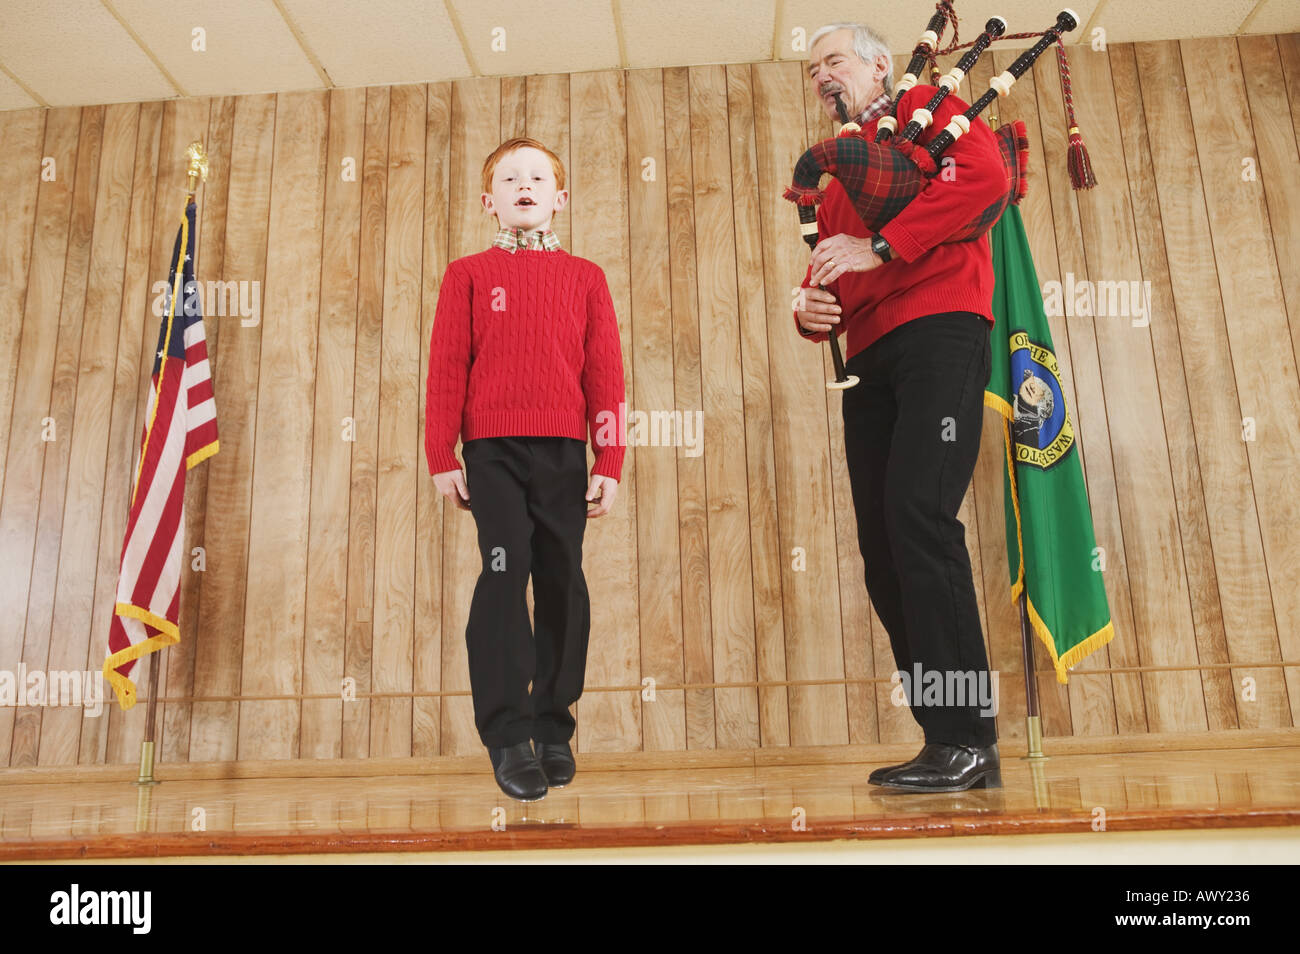 Young boy dancing to bagpipe music Stock Photo